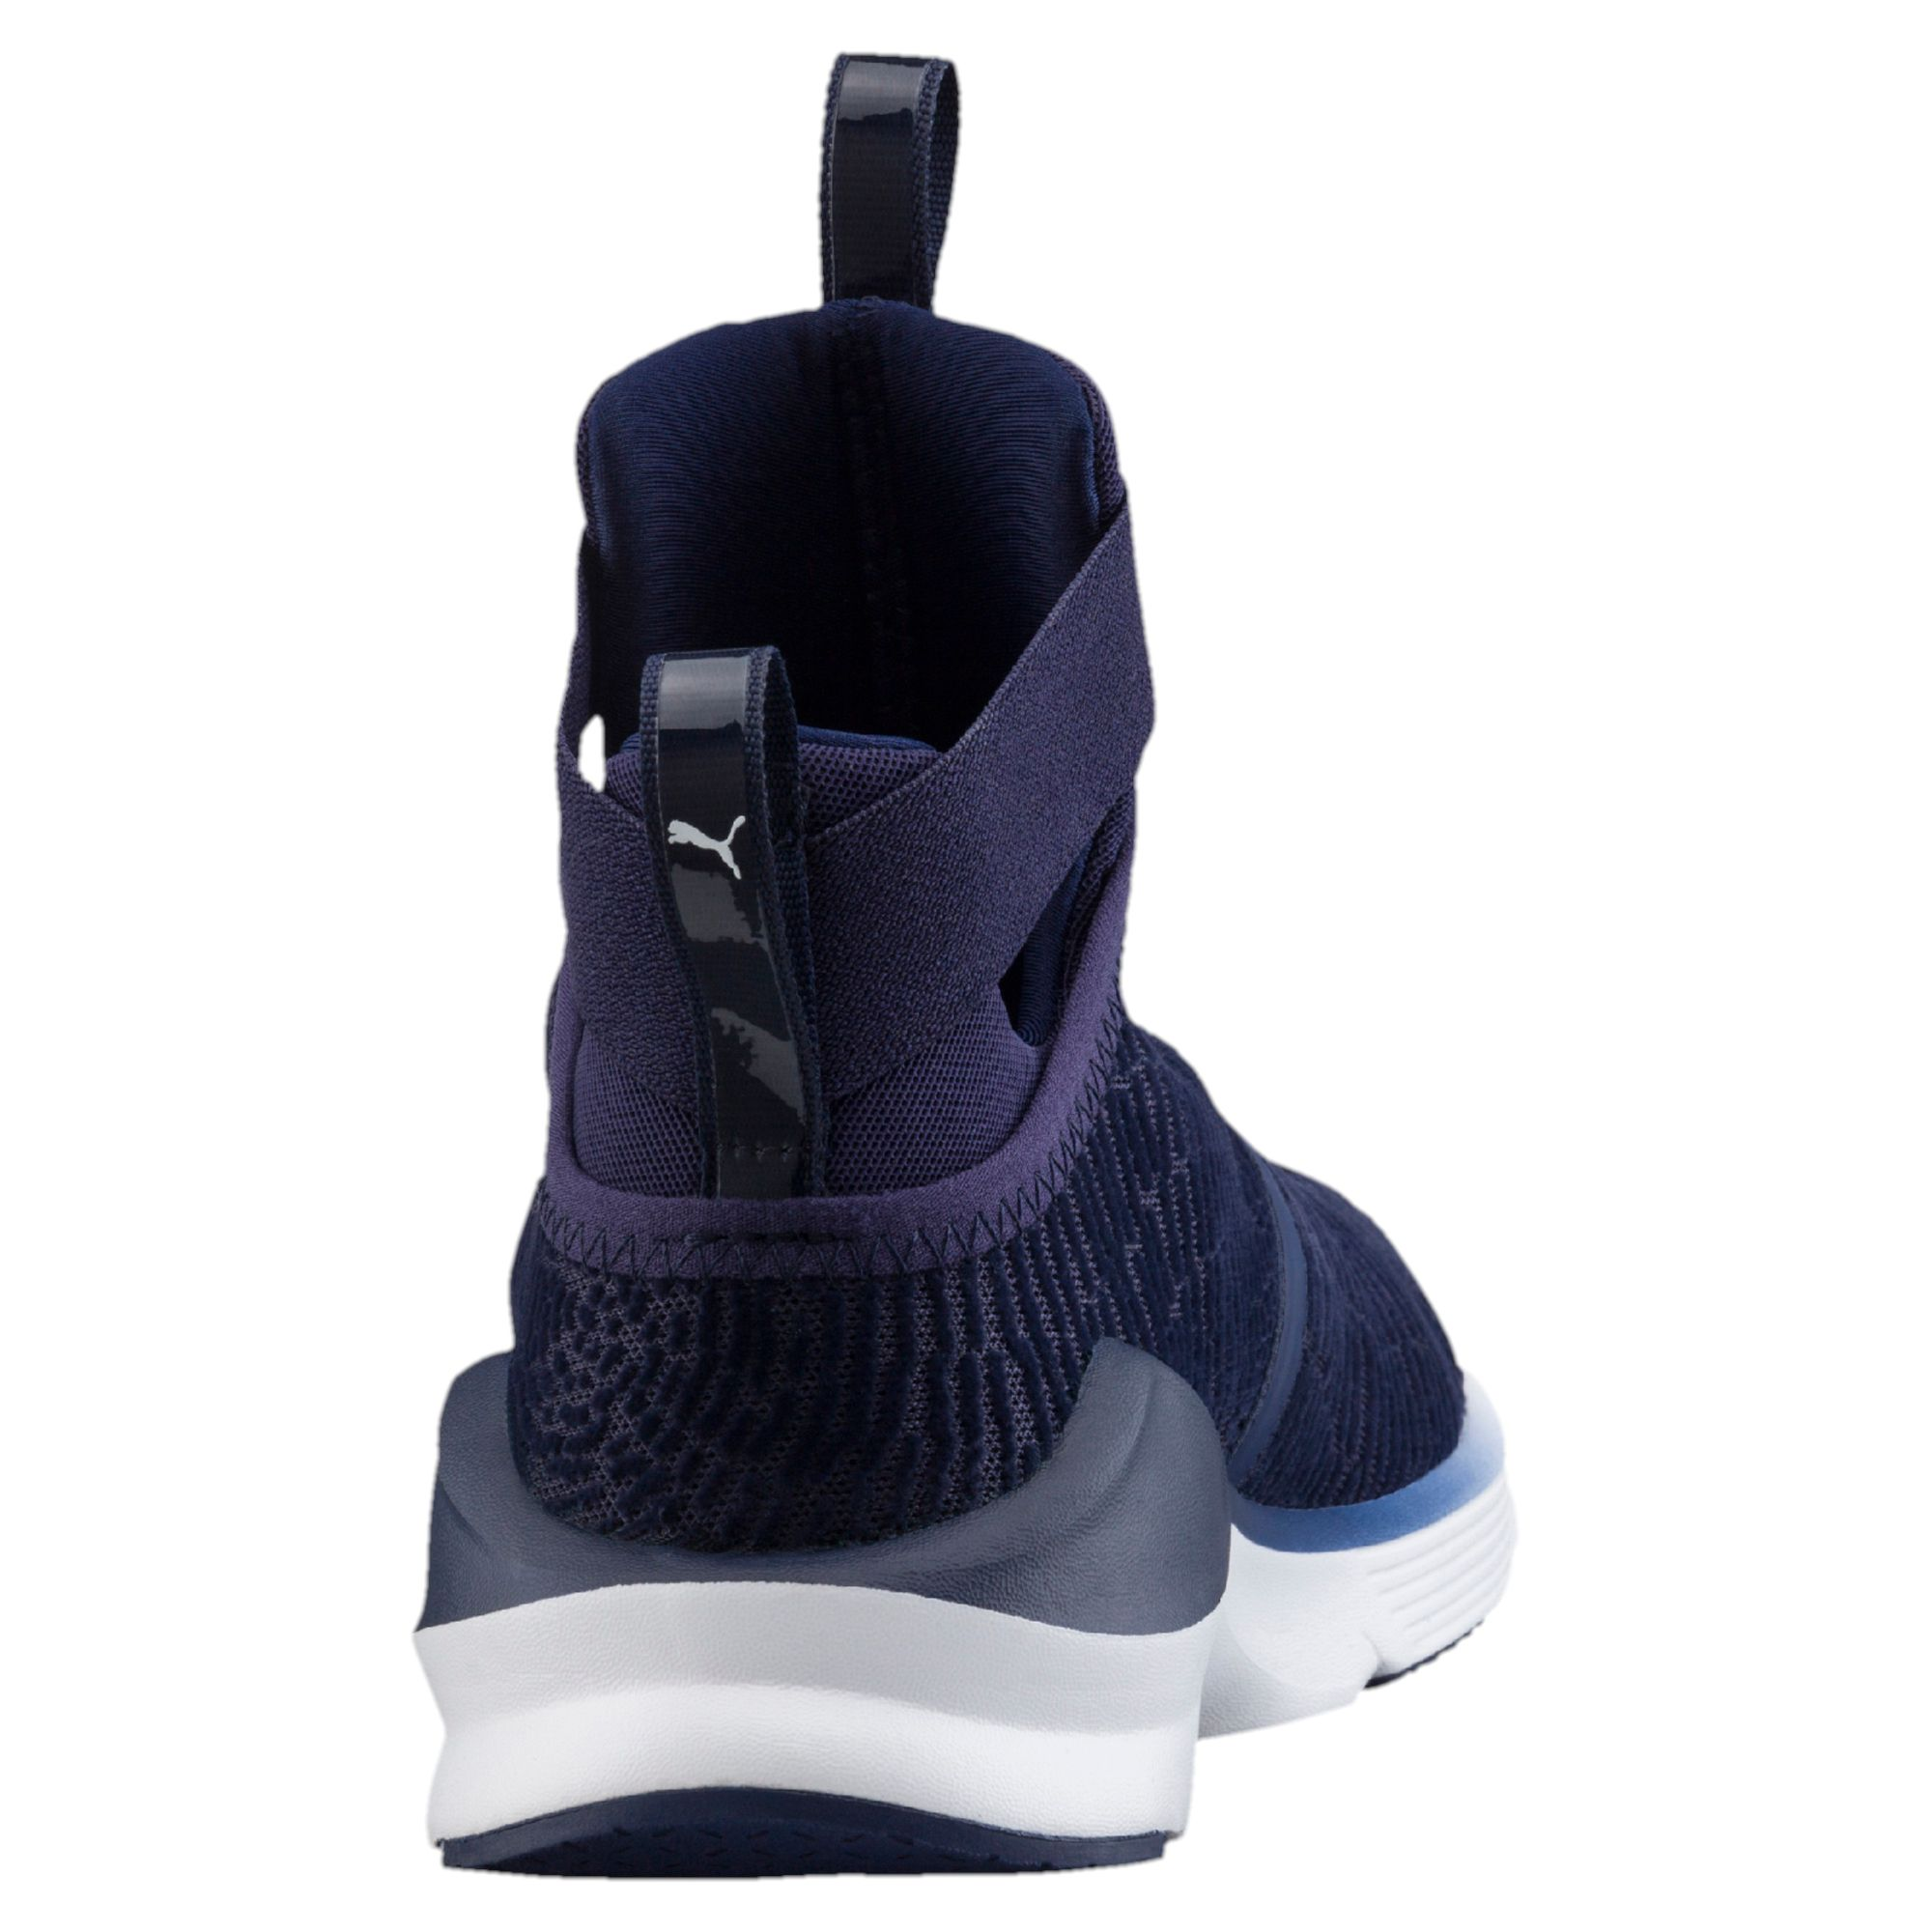 bf3889c80222 PUMA PUMA Fierce Strap Flocking Training Shoes Training Low Boot ...